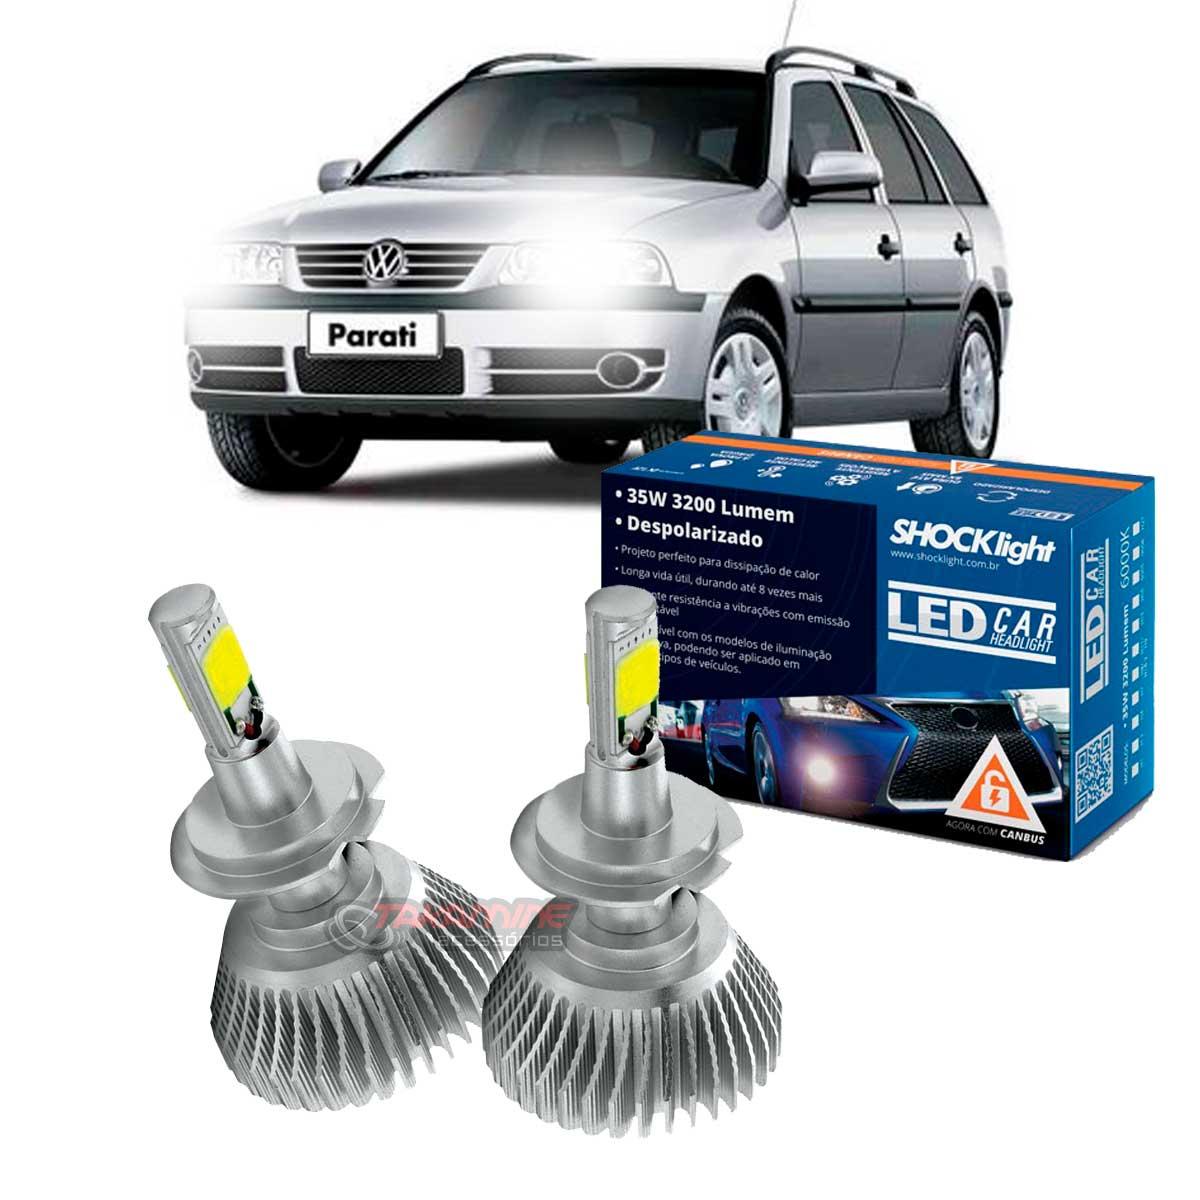 Kit LED Parati G3 Farol Duplo 2000 2001 2002 2003 2004 2005 tipo xenon farol baixo H7  35W Headlight